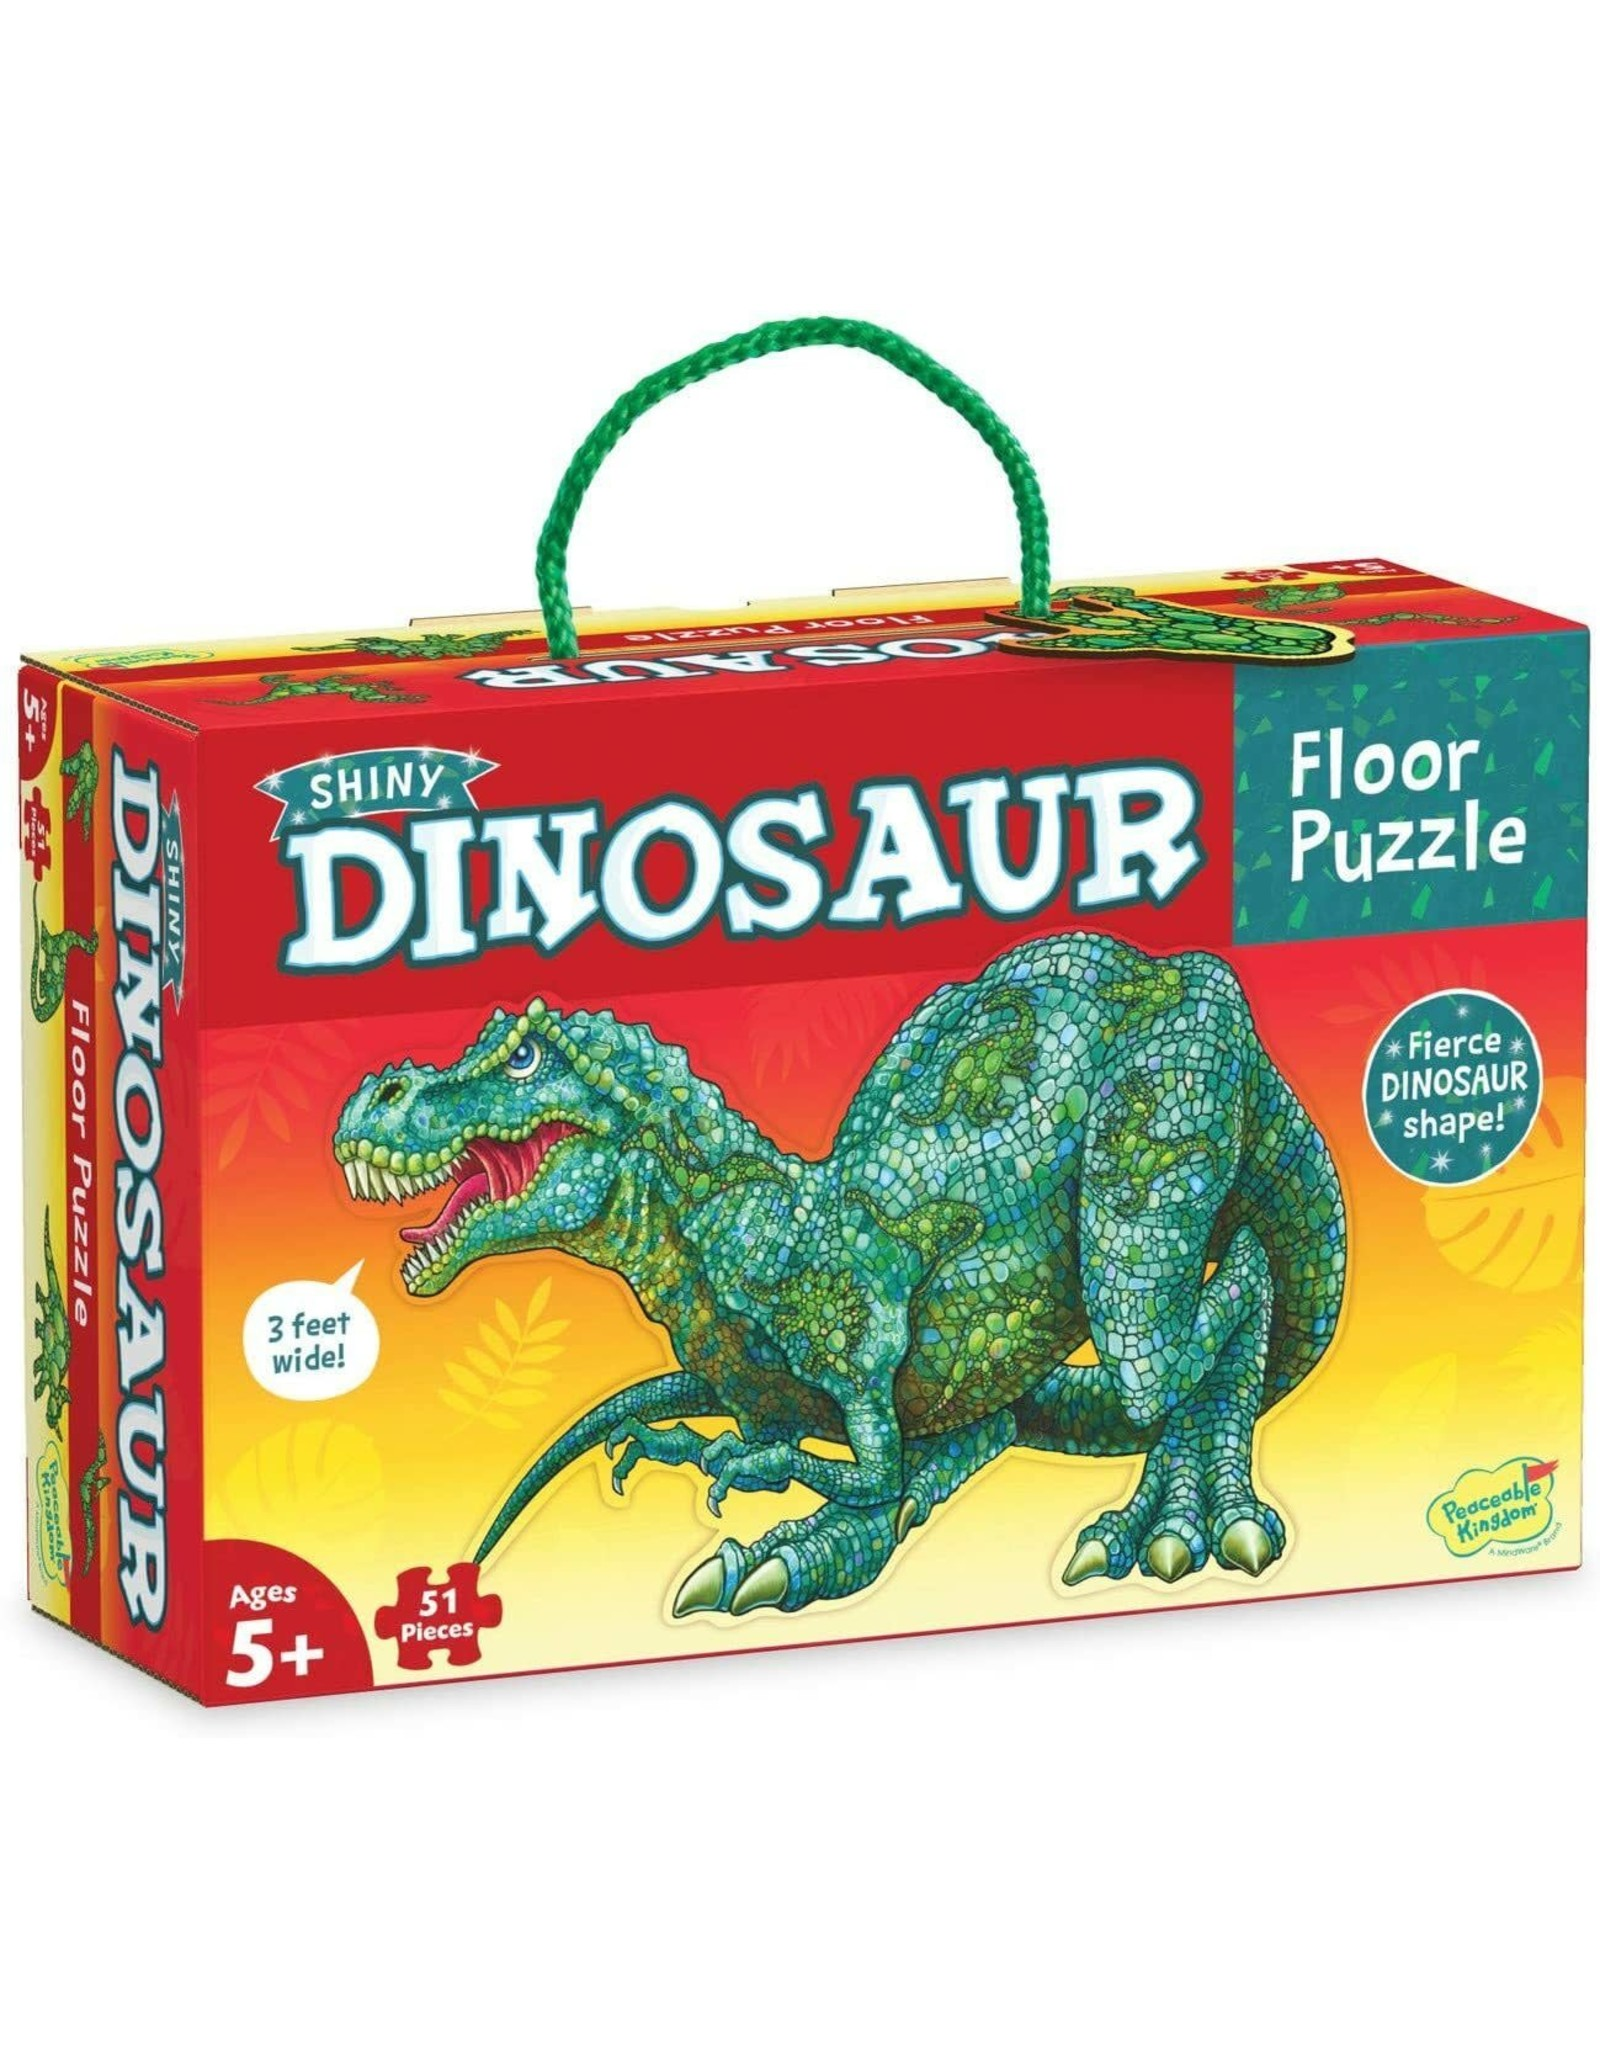 Peaceable Kingdom Floor Puzzle: Shiny Dinosaur